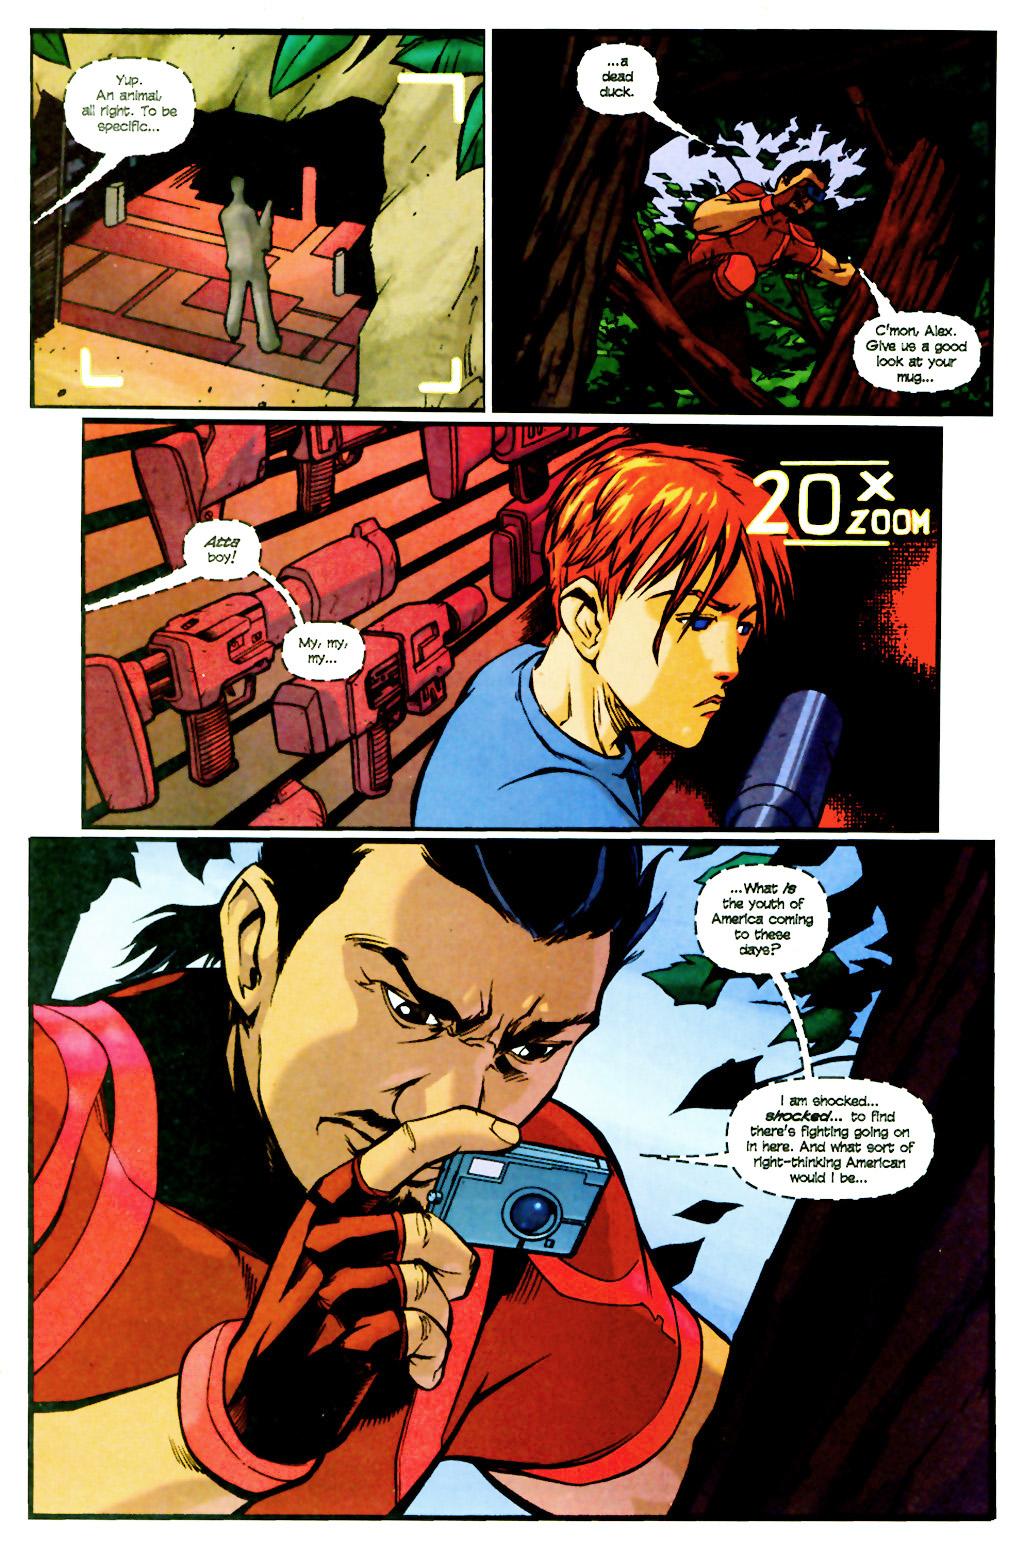 Read online SpyBoy: Final Exam comic -  Issue #2 - 16